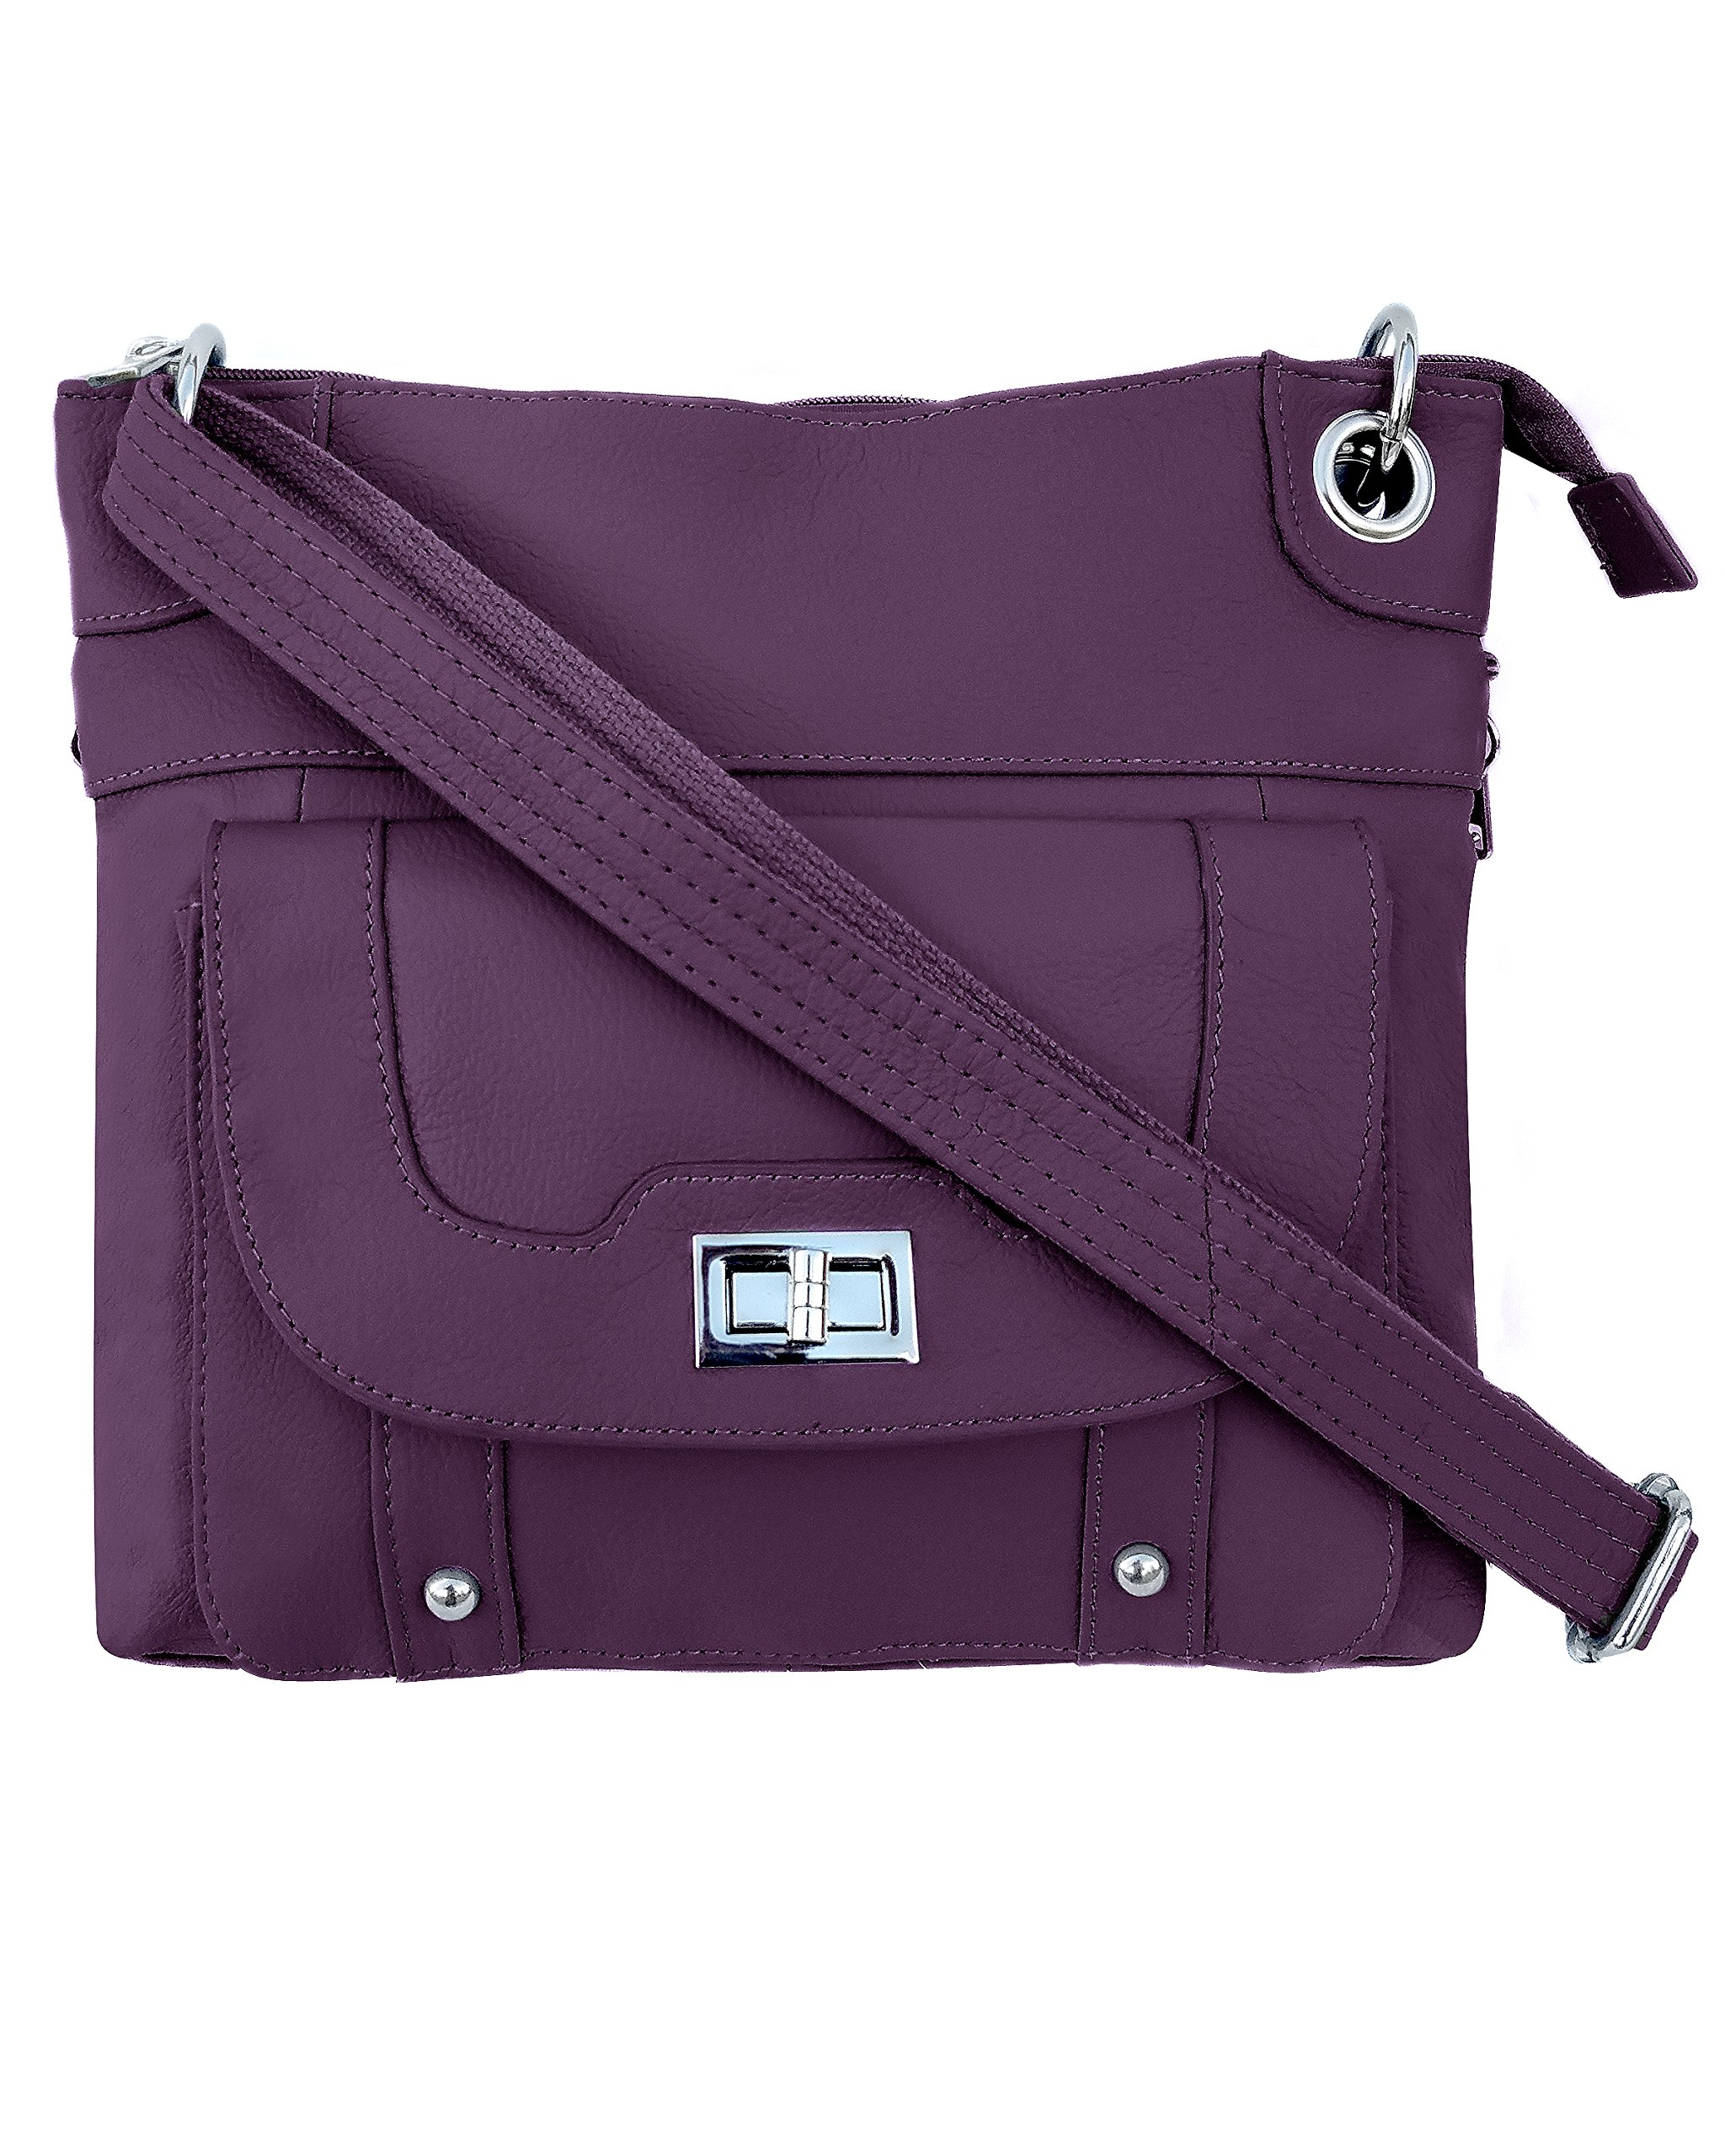 Ladies' Gun Concealment Crossbody Bag Purple